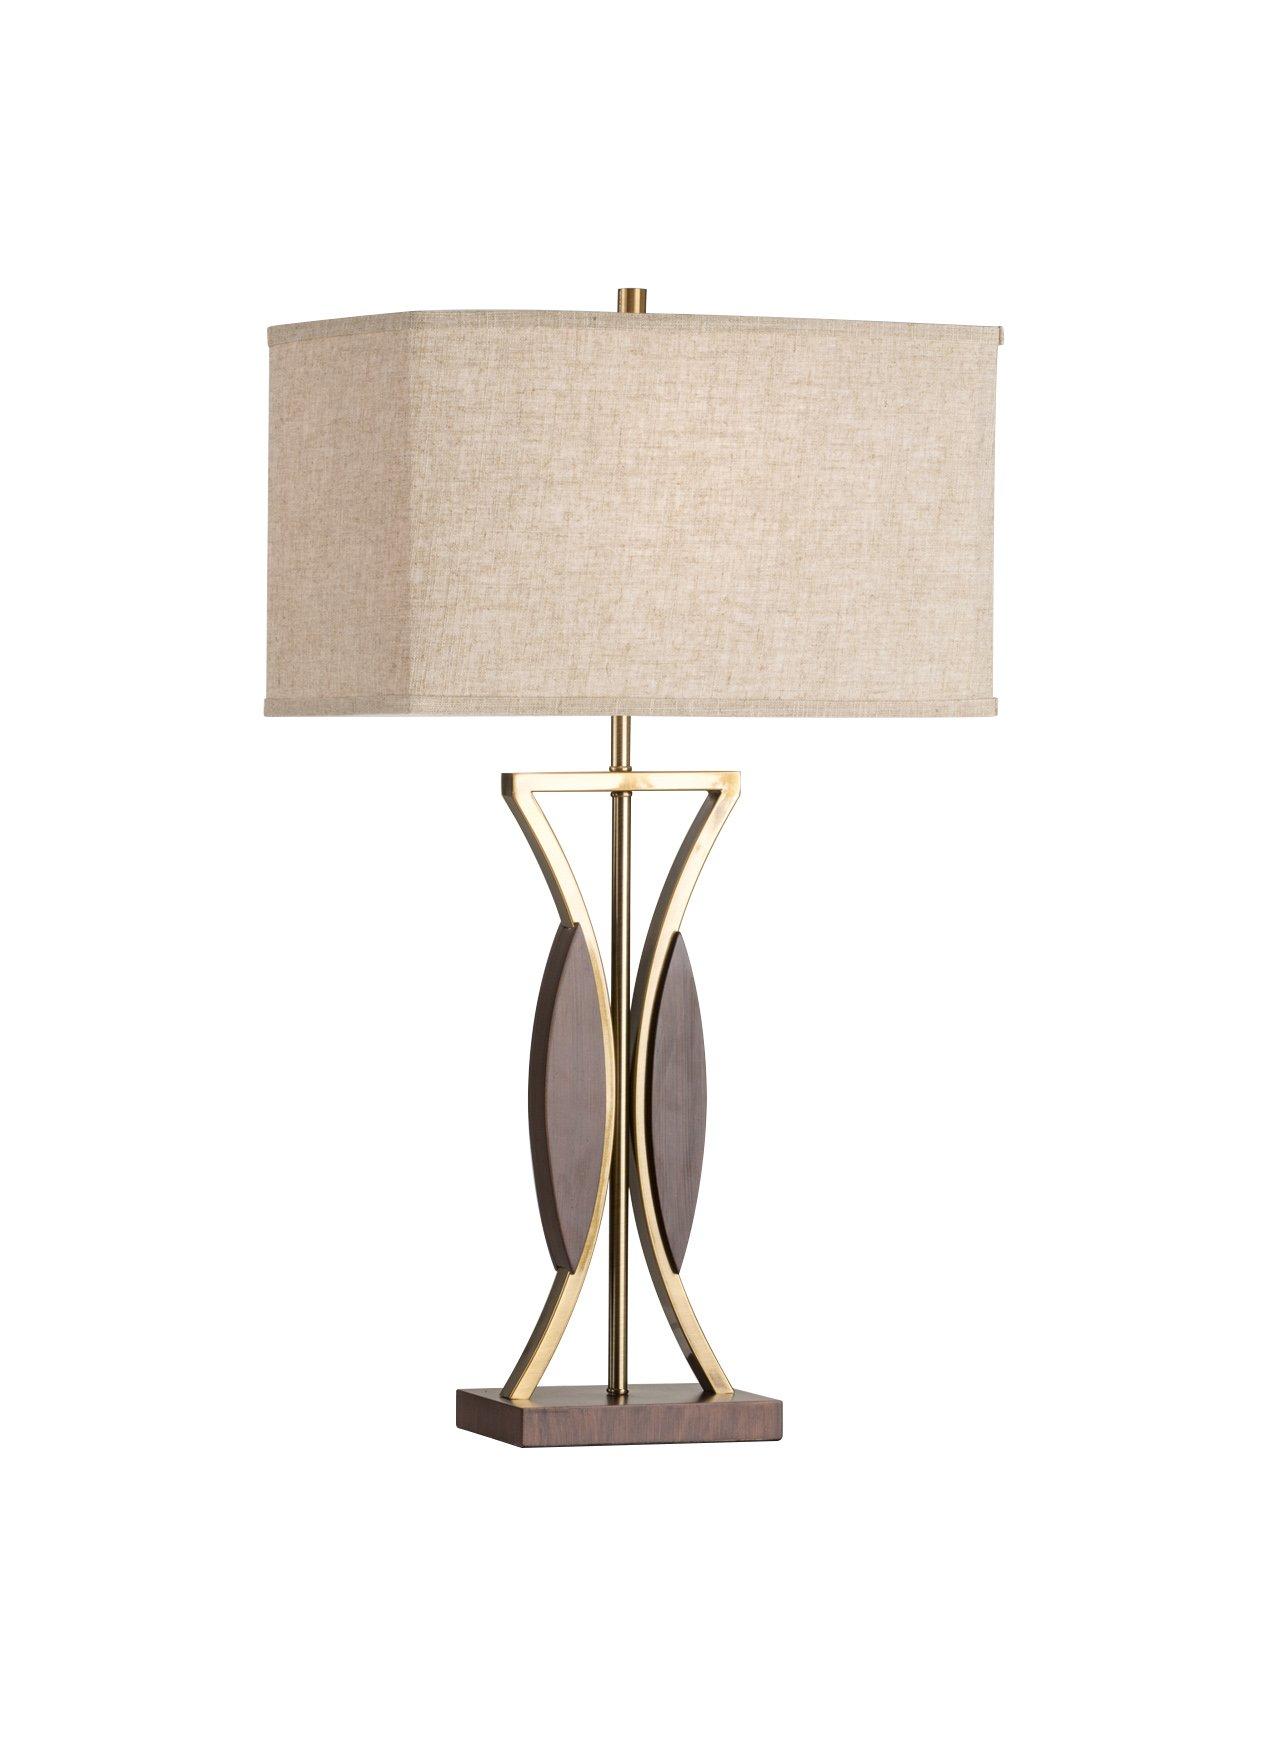 Nova Lighting Clessidra Contemporary Table Lamp, Rose Gold